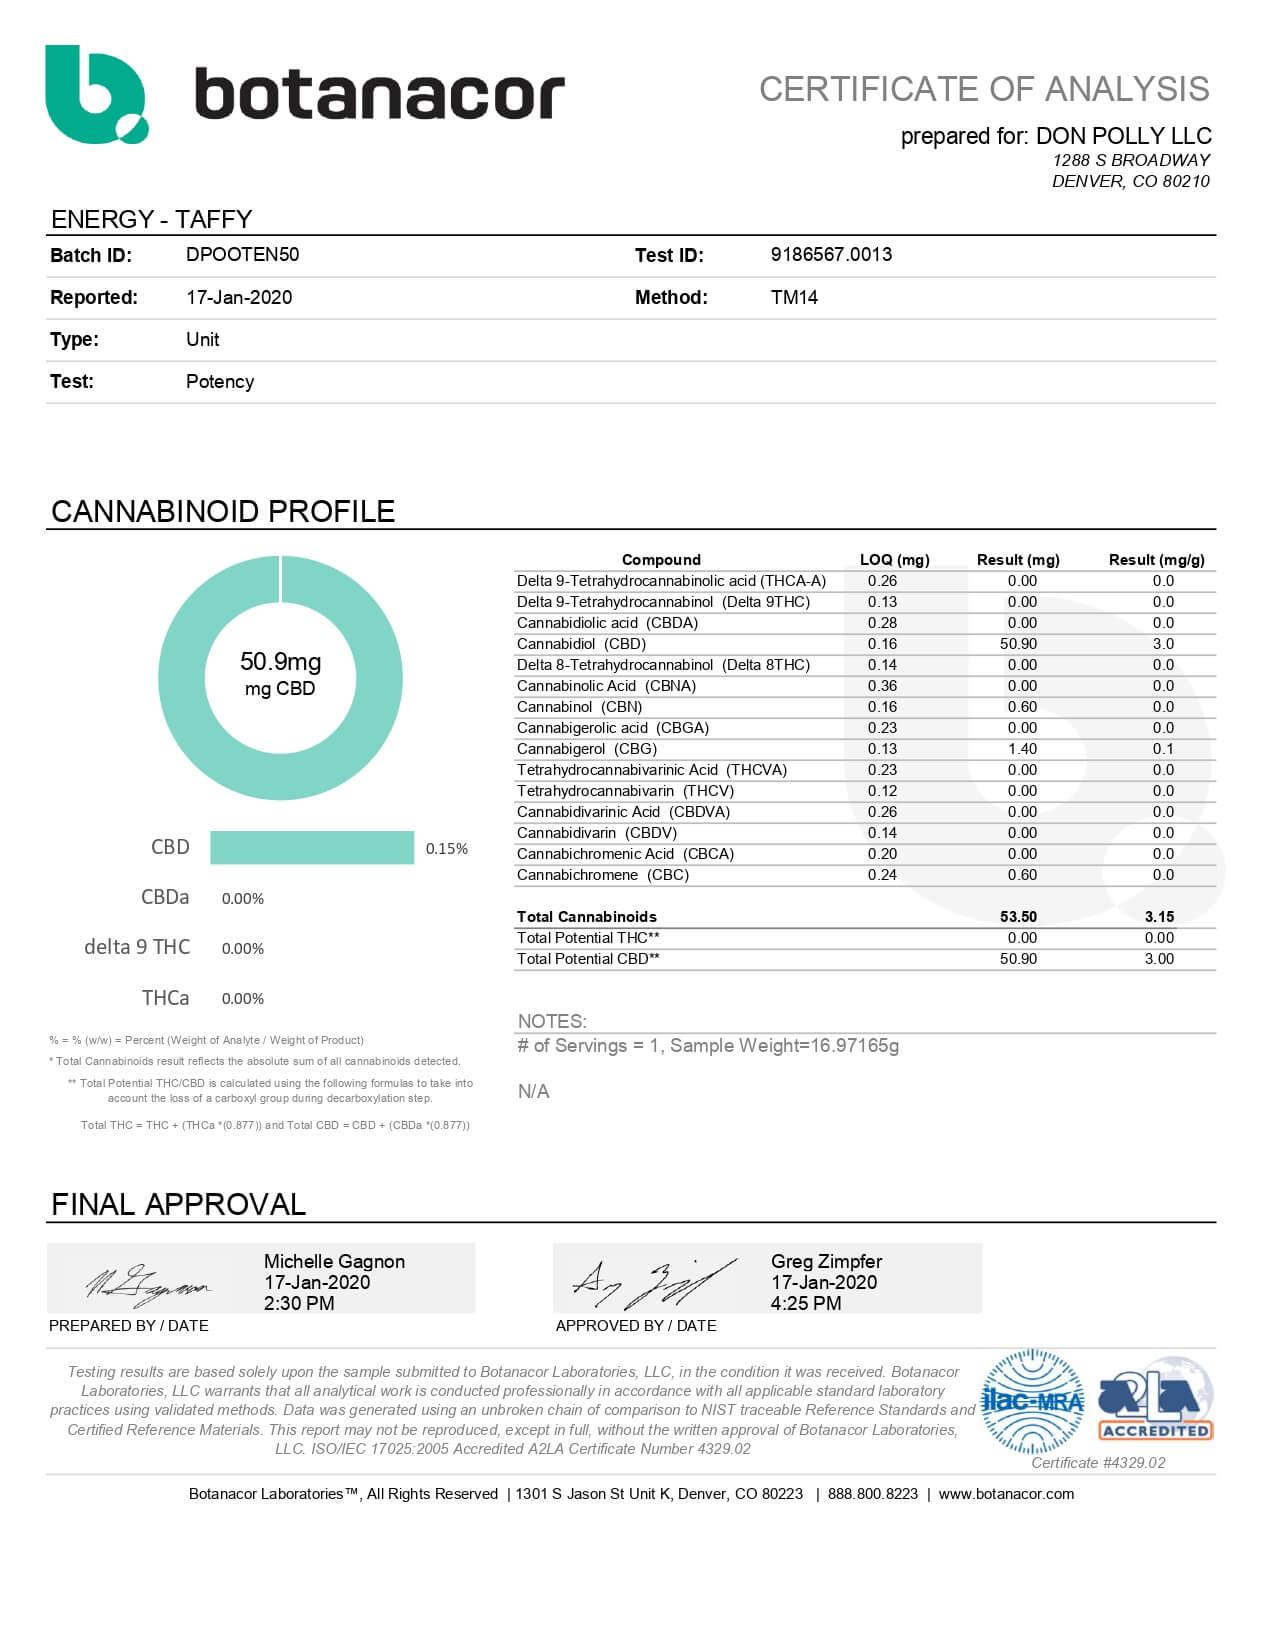 Don Polly CBD Edible Energy Taffy Lab Report